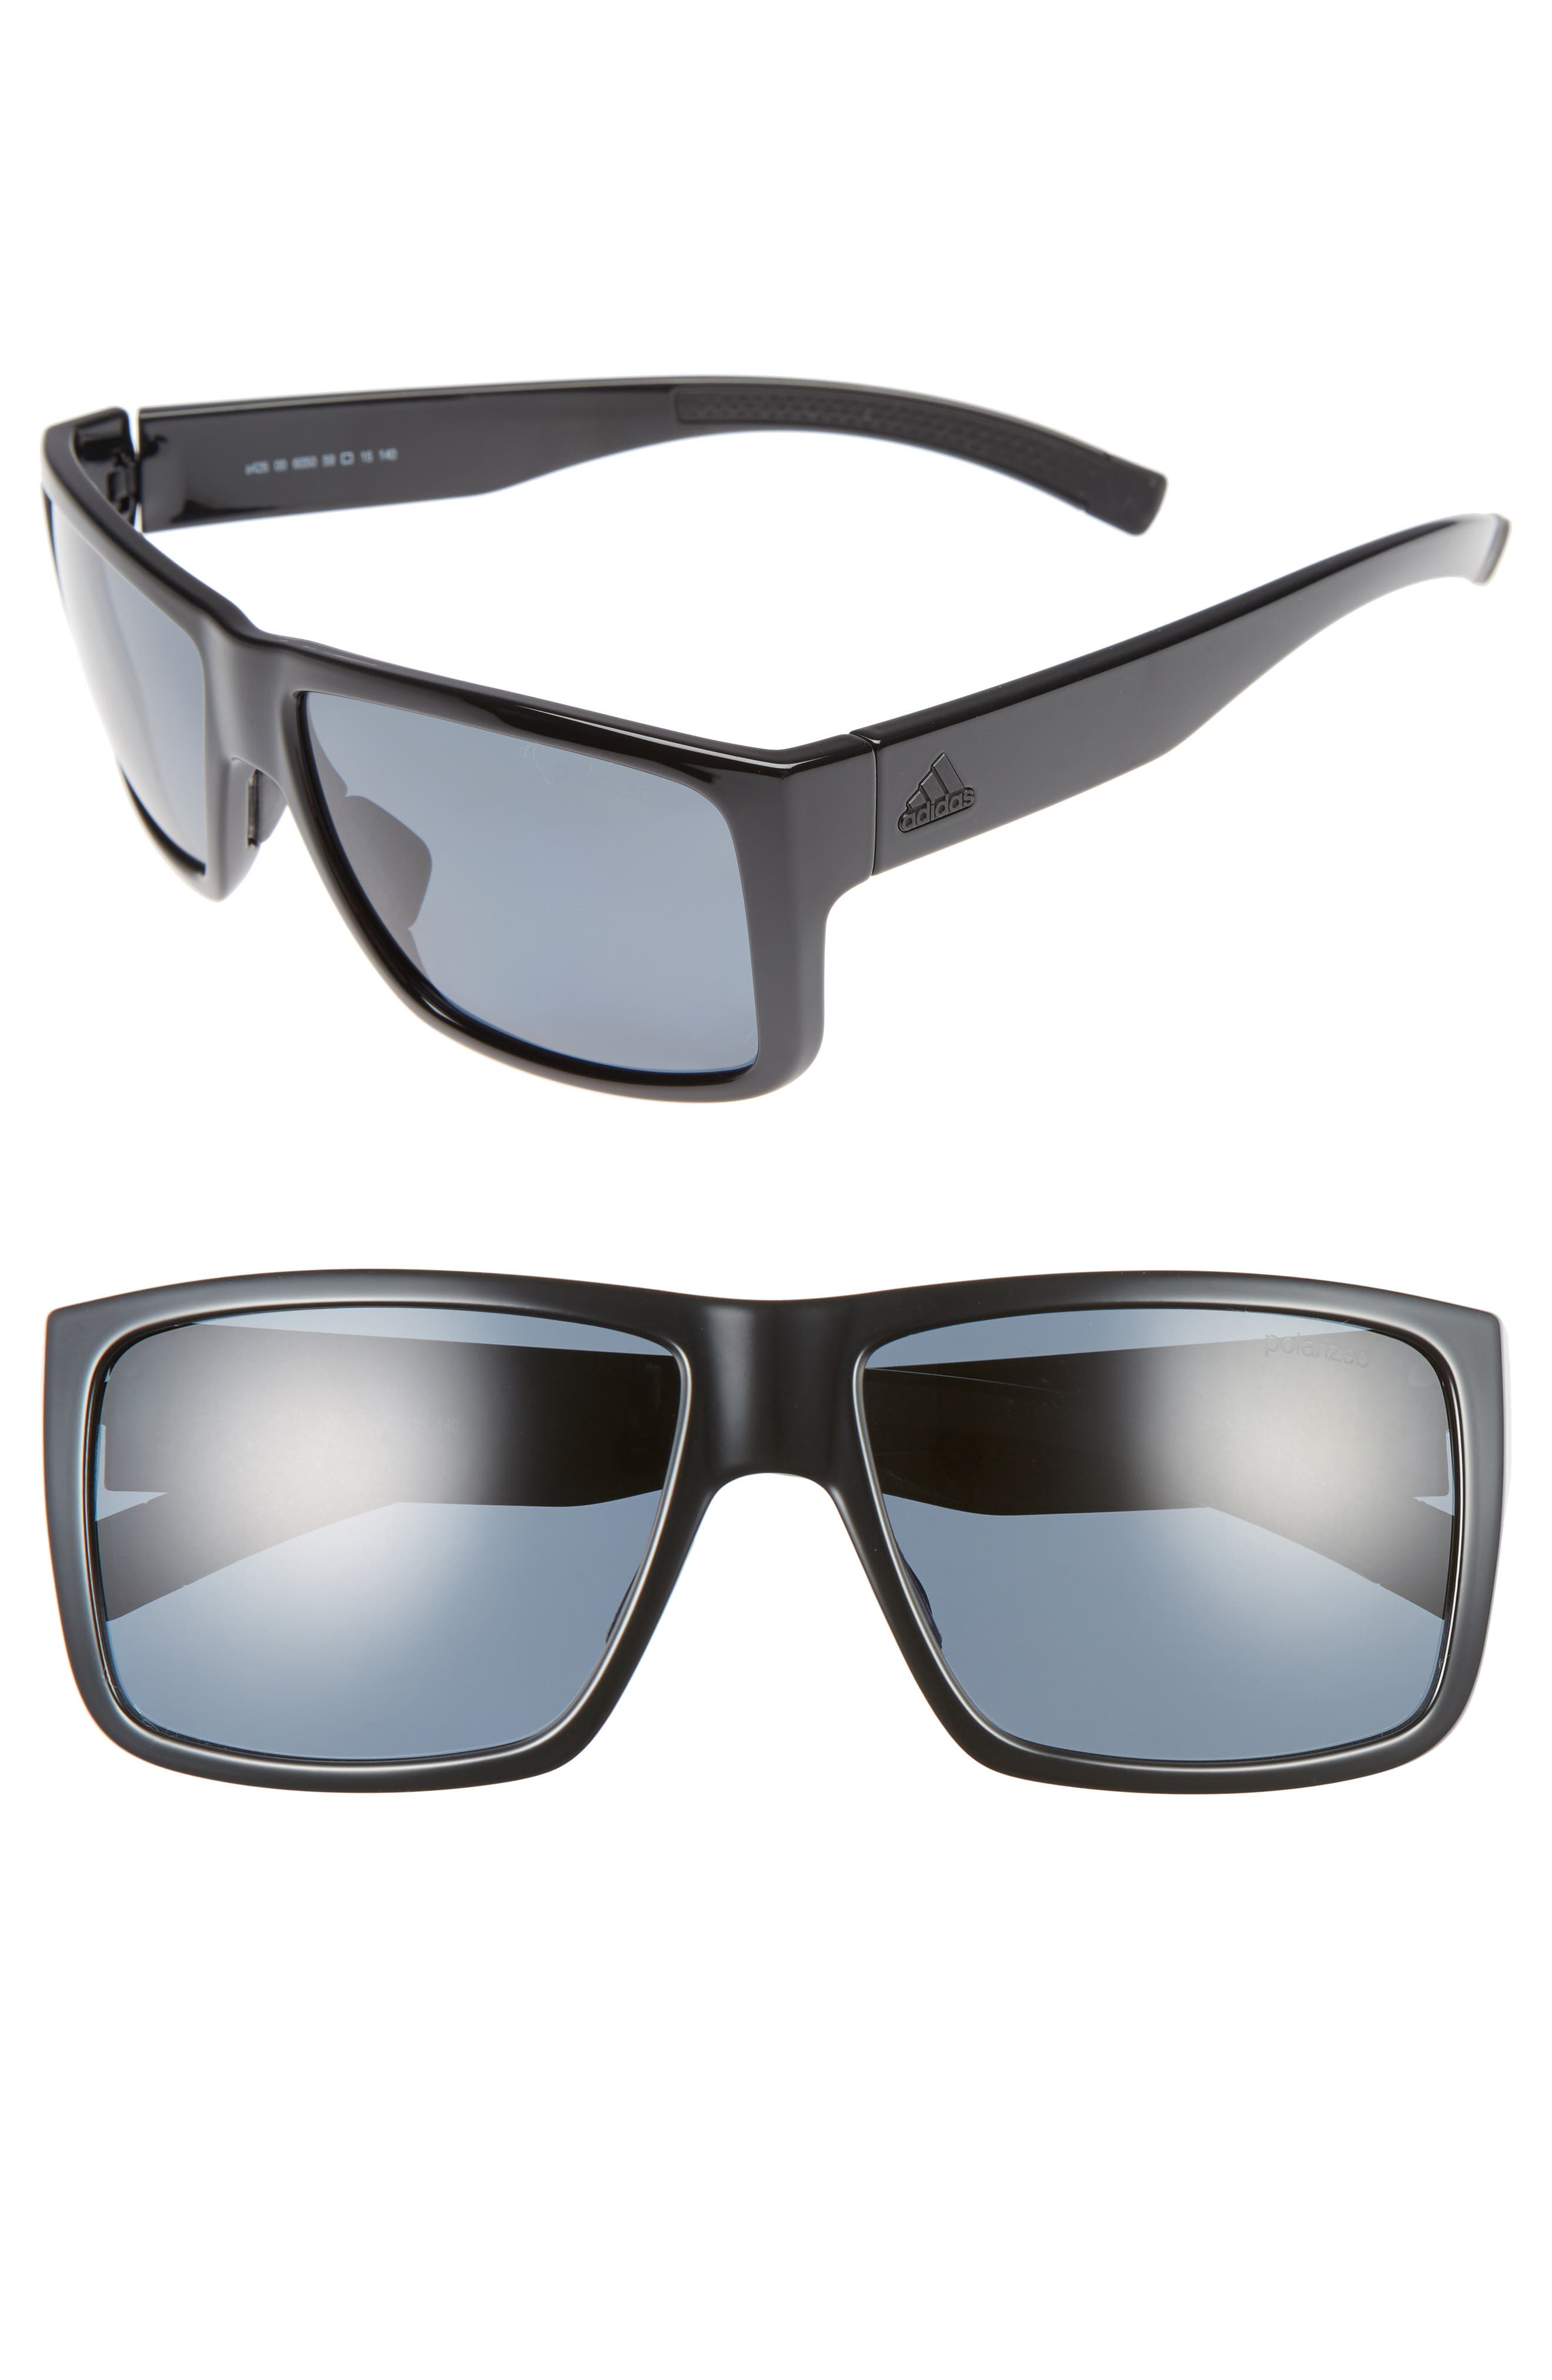 Matic 59mm Sunglasses,                         Main,                         color, SHINY BLACK/ GREY POLAR